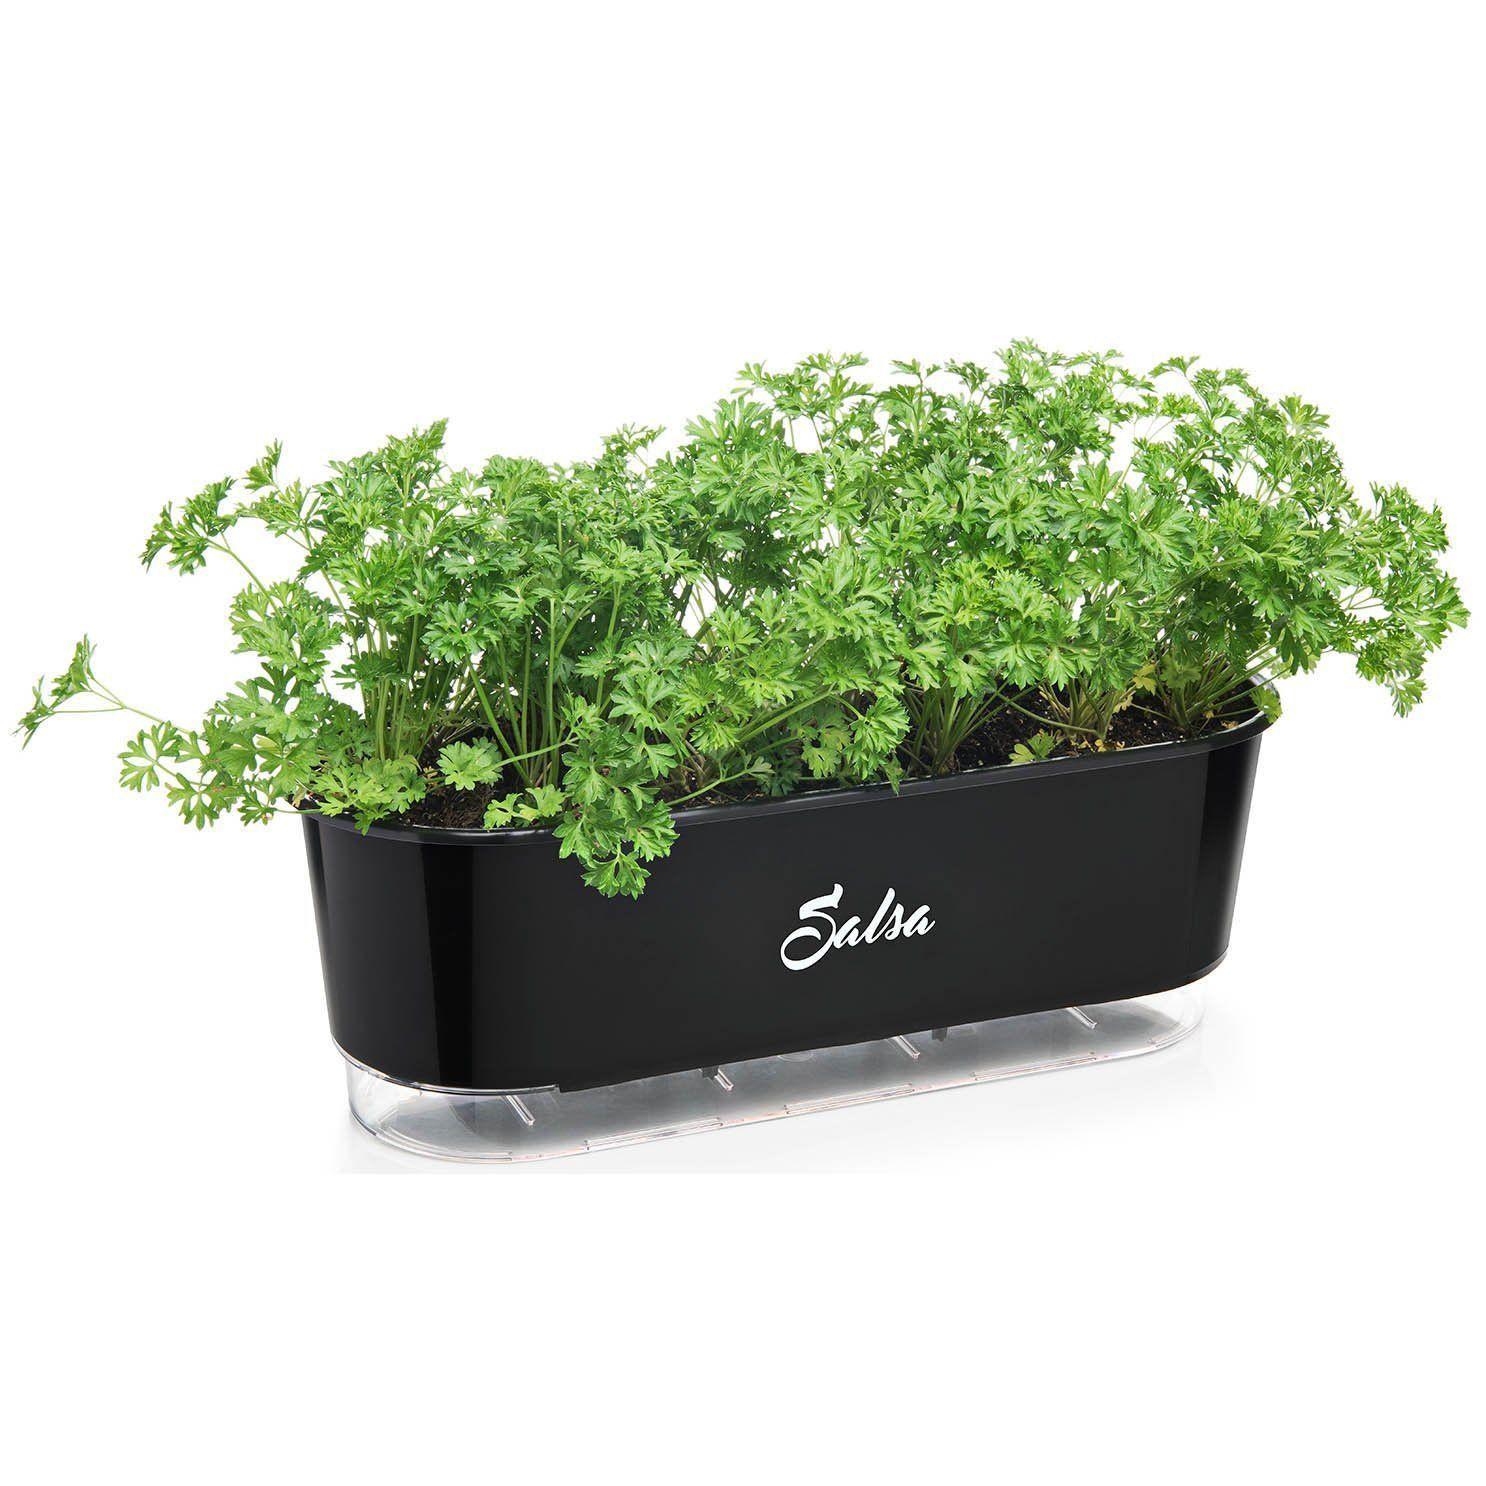 Jardineira Autoirrigável Salsa 40cm Preto